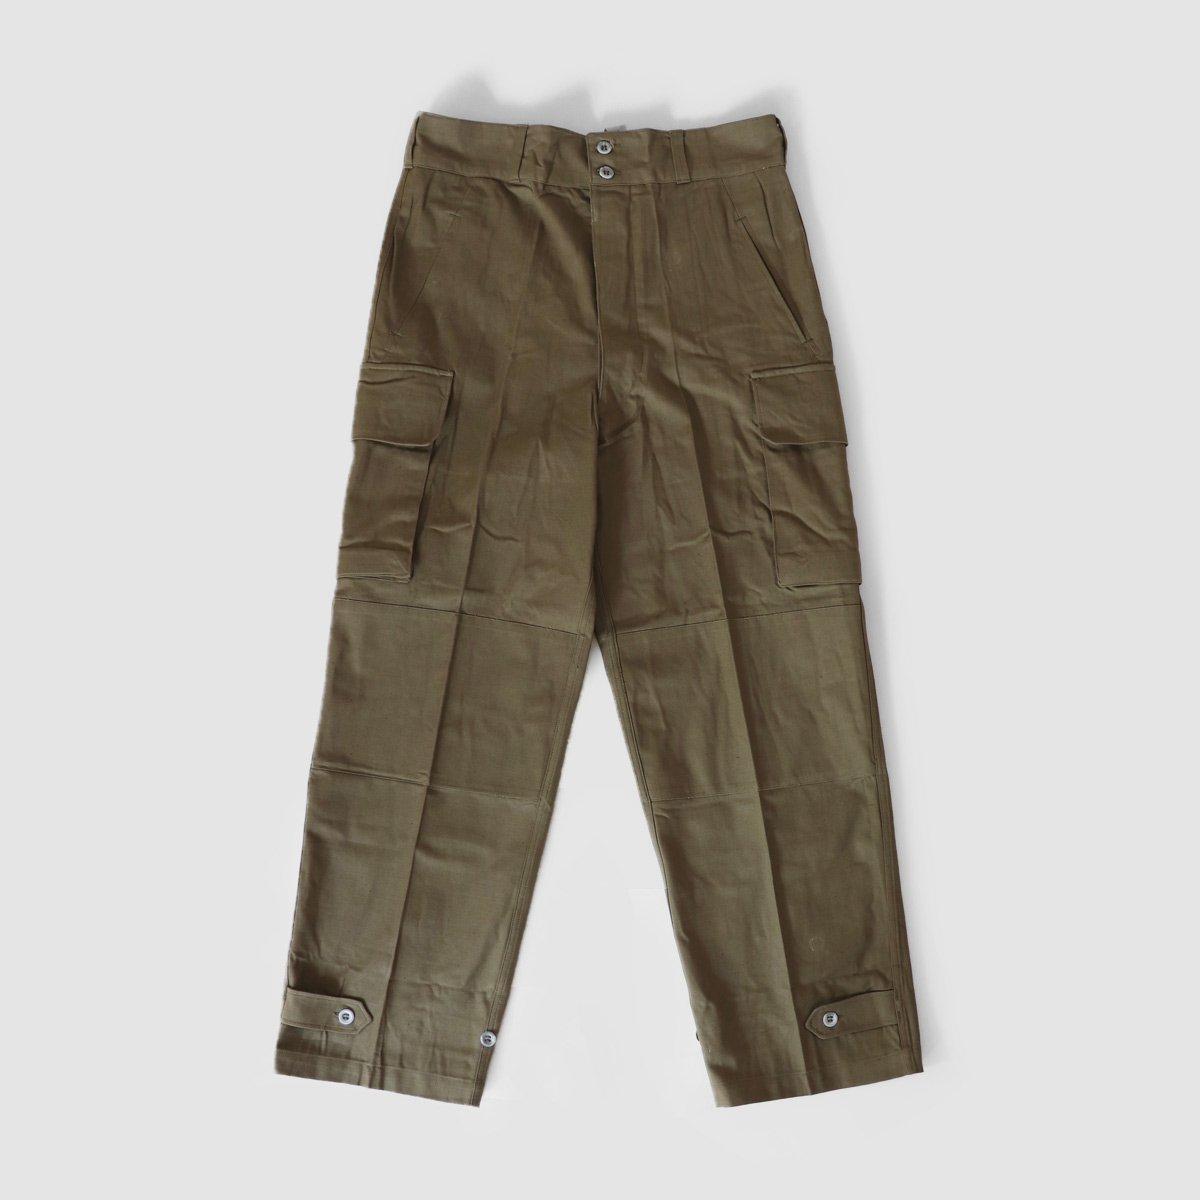 FRENCH ARMY M47 PANTS 詳細画像1